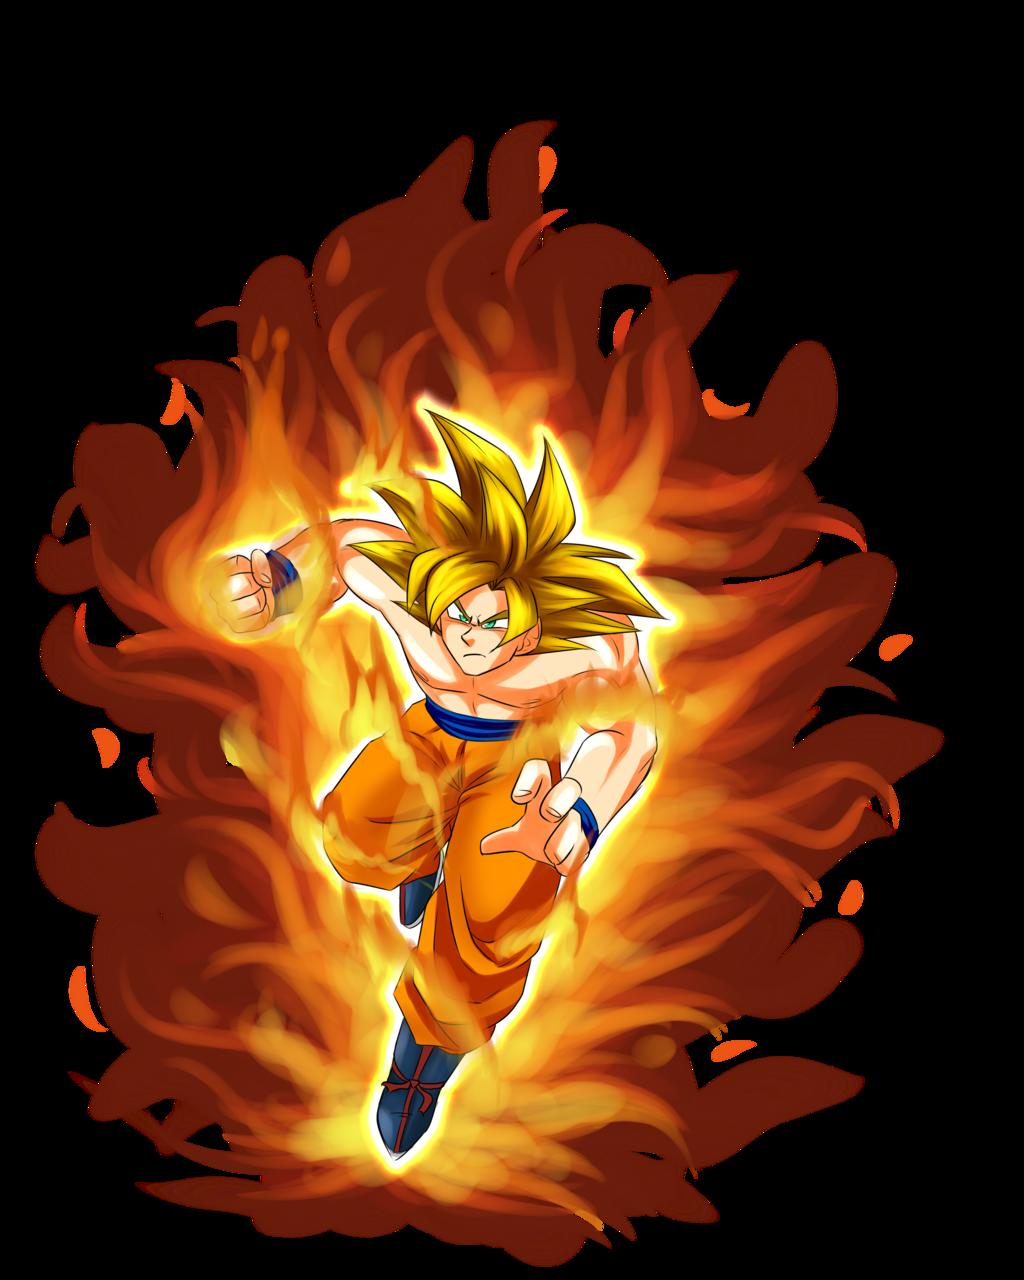 Saiyan God By Rigorm0rtis Saiyan Dragon Ball Super Saiyan God